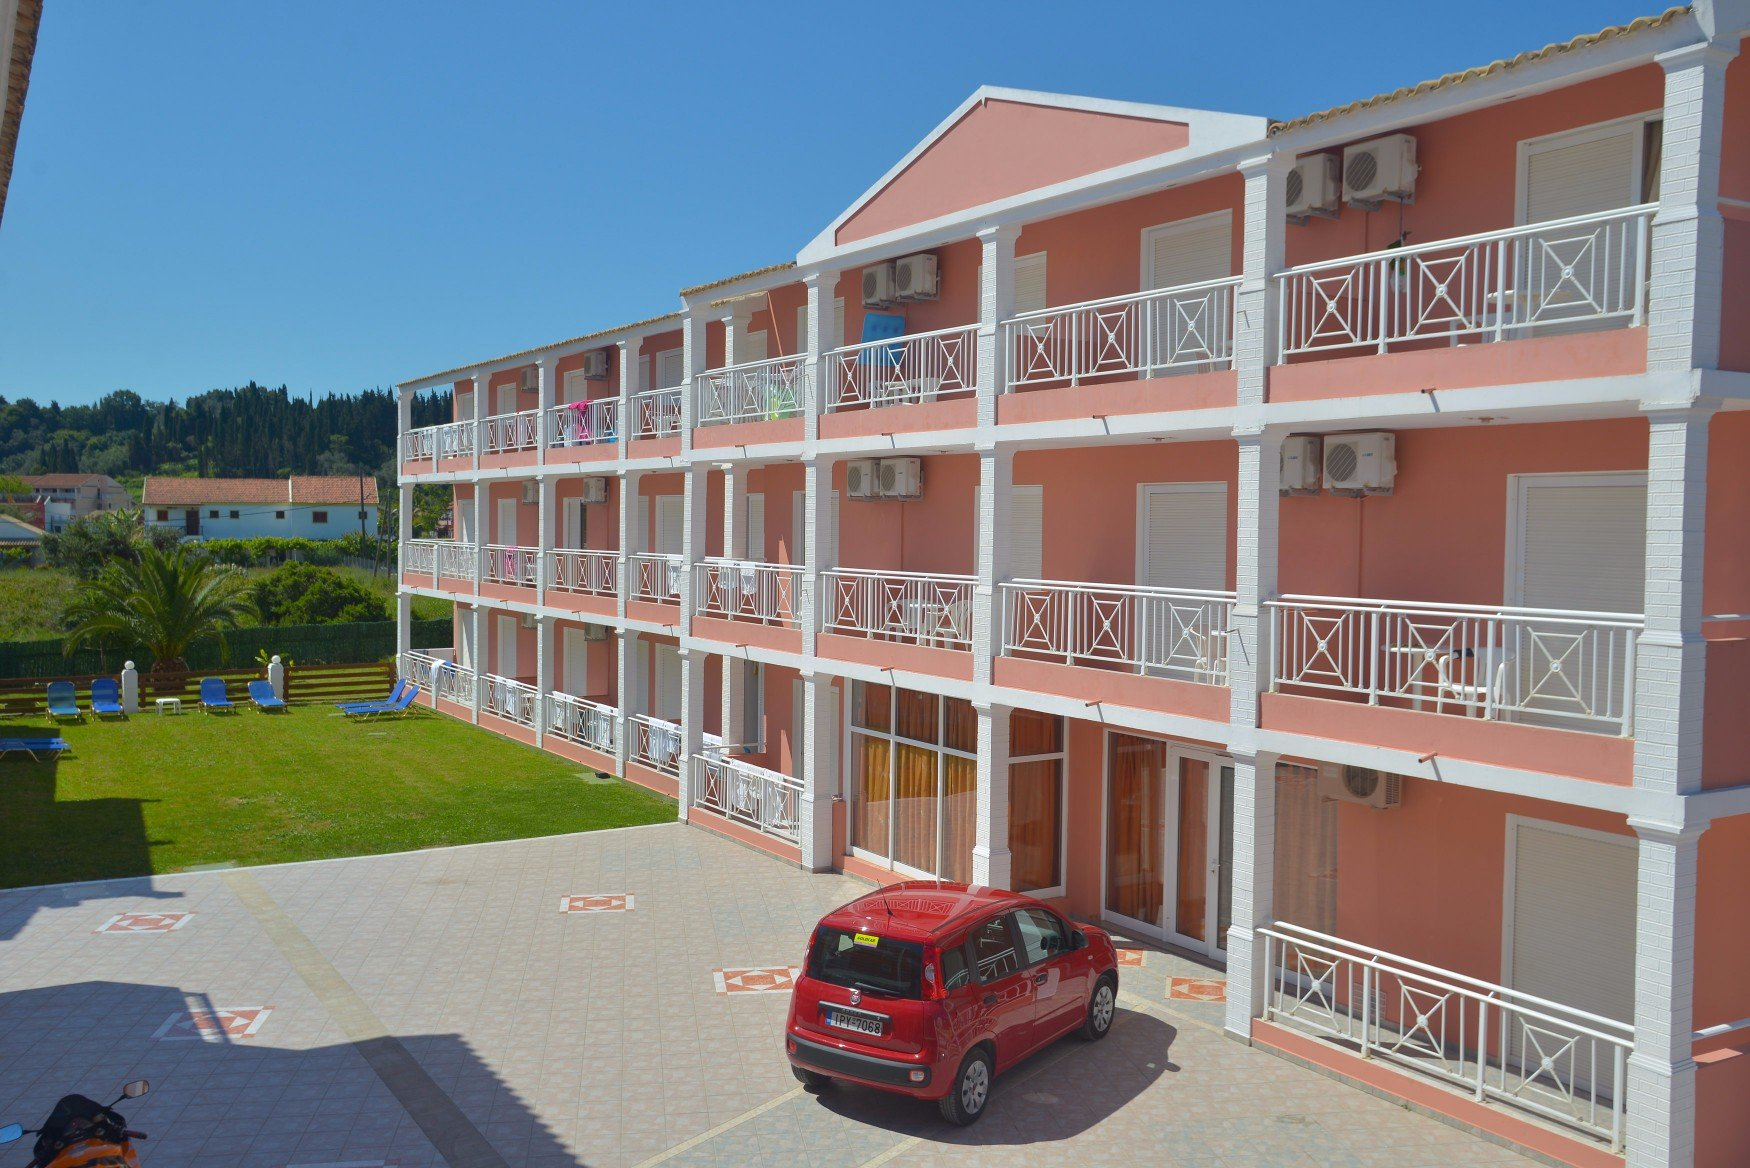 angelina-hotel-sidari-corfu-general-2